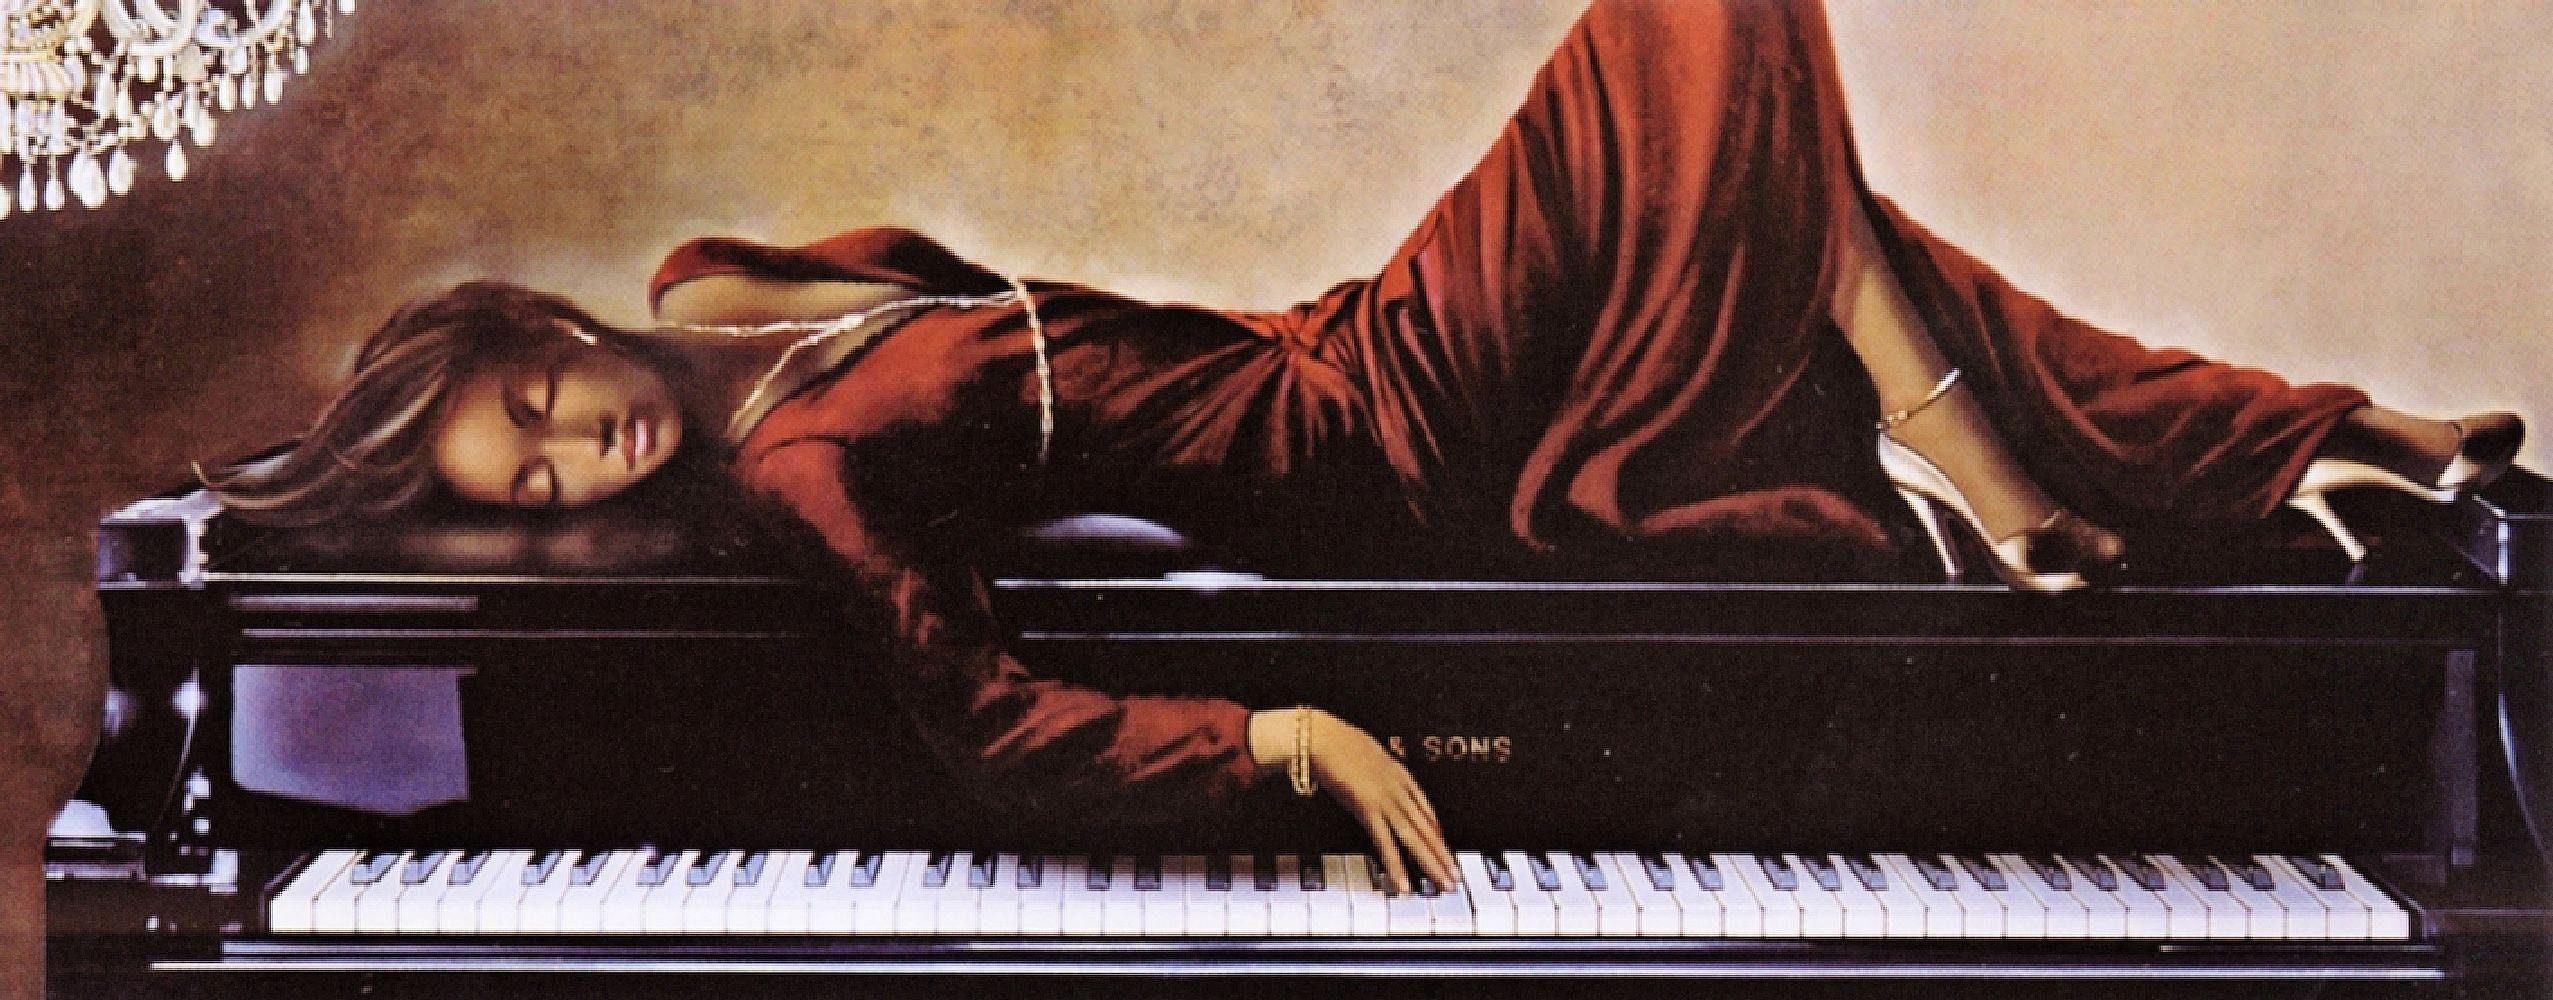 Home Affaire Bild, Kunstdruck, »Di Scenza / Into the rhytm«, 120/47/1,3 cm